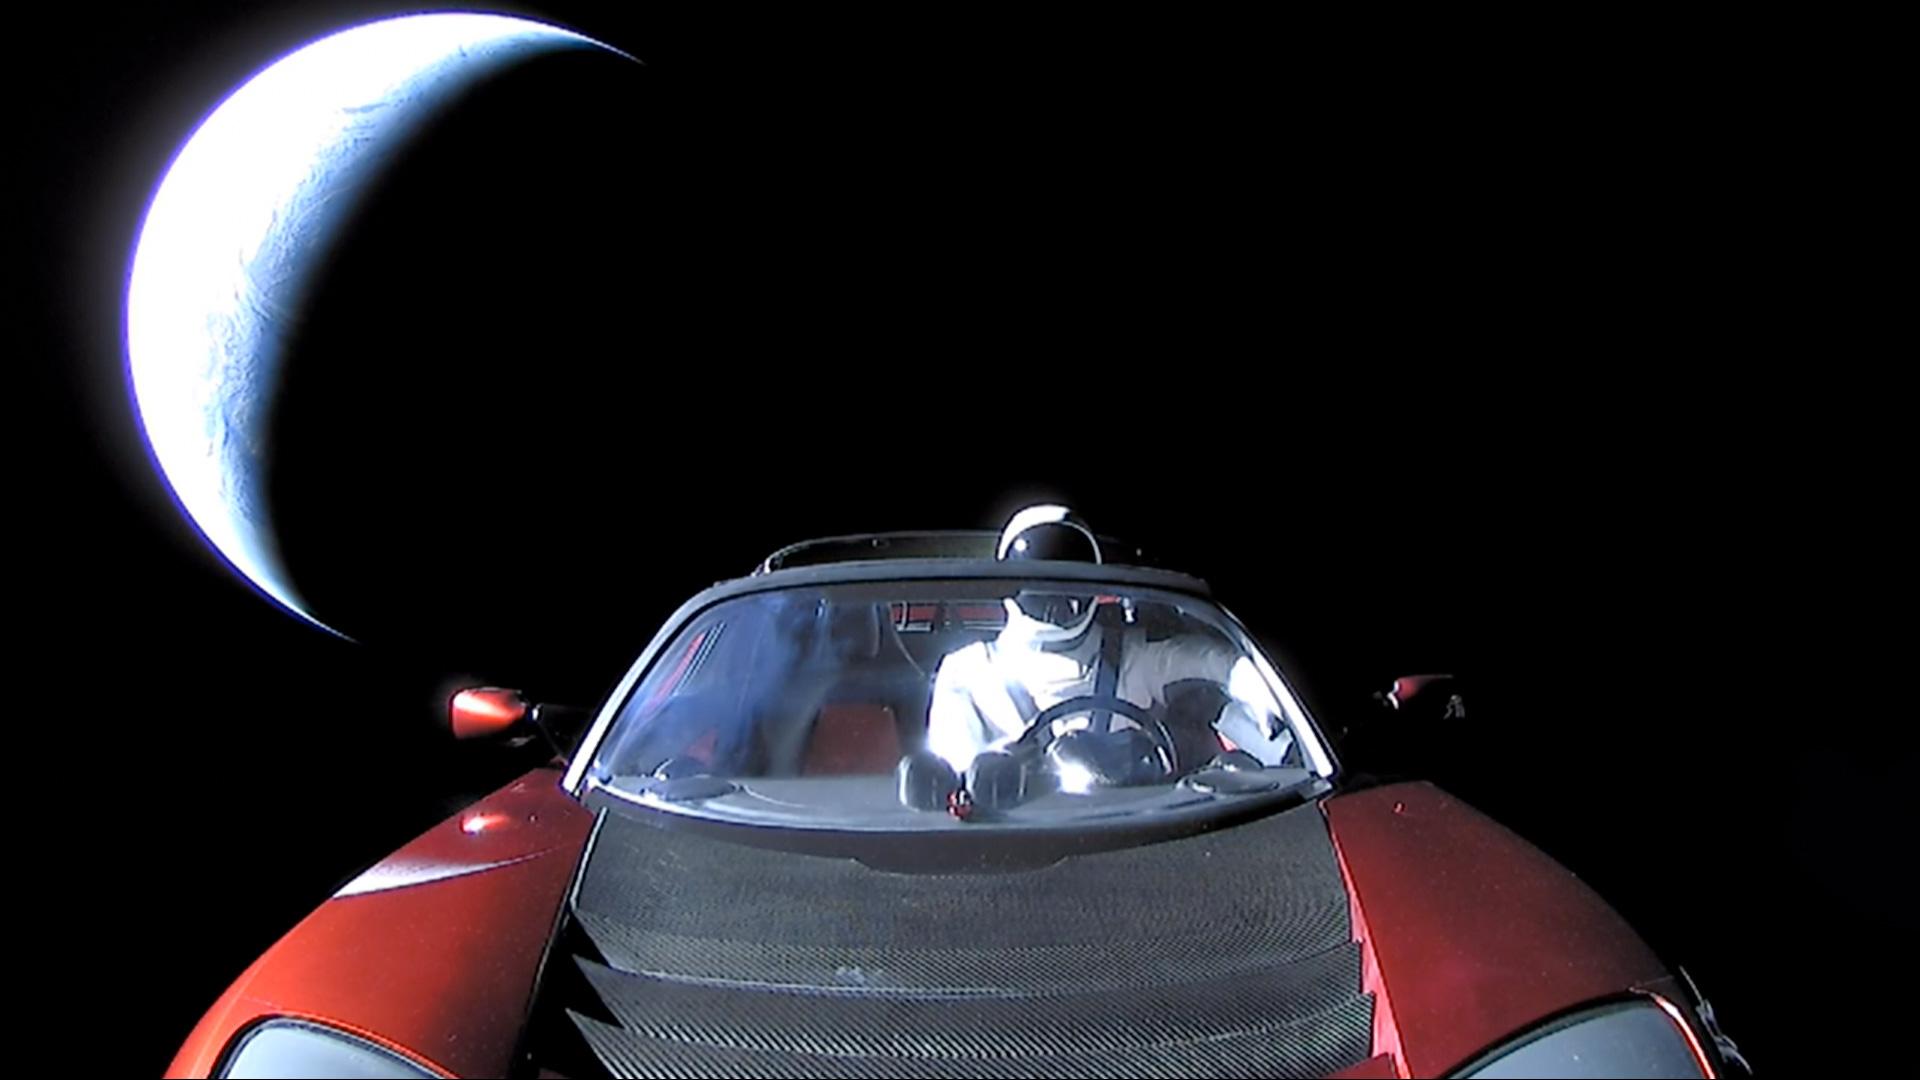 SpaceX, Tesla, Falcon Heavy